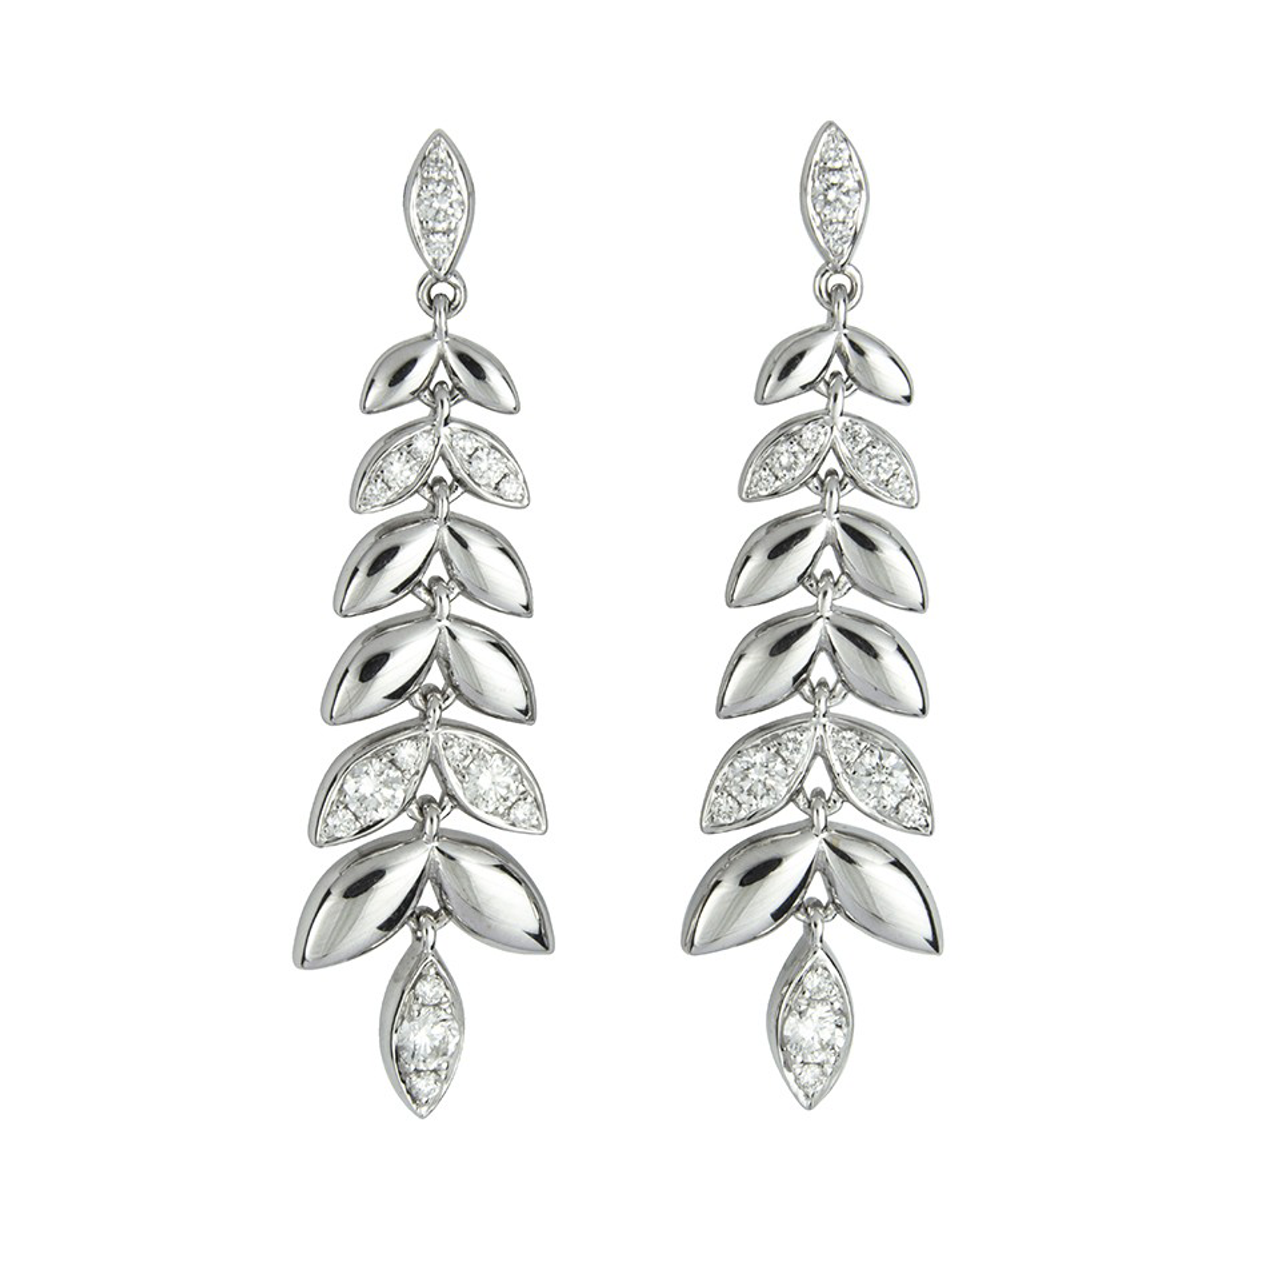 18ct White Gold Diamond Barleycorn Drop Earrings